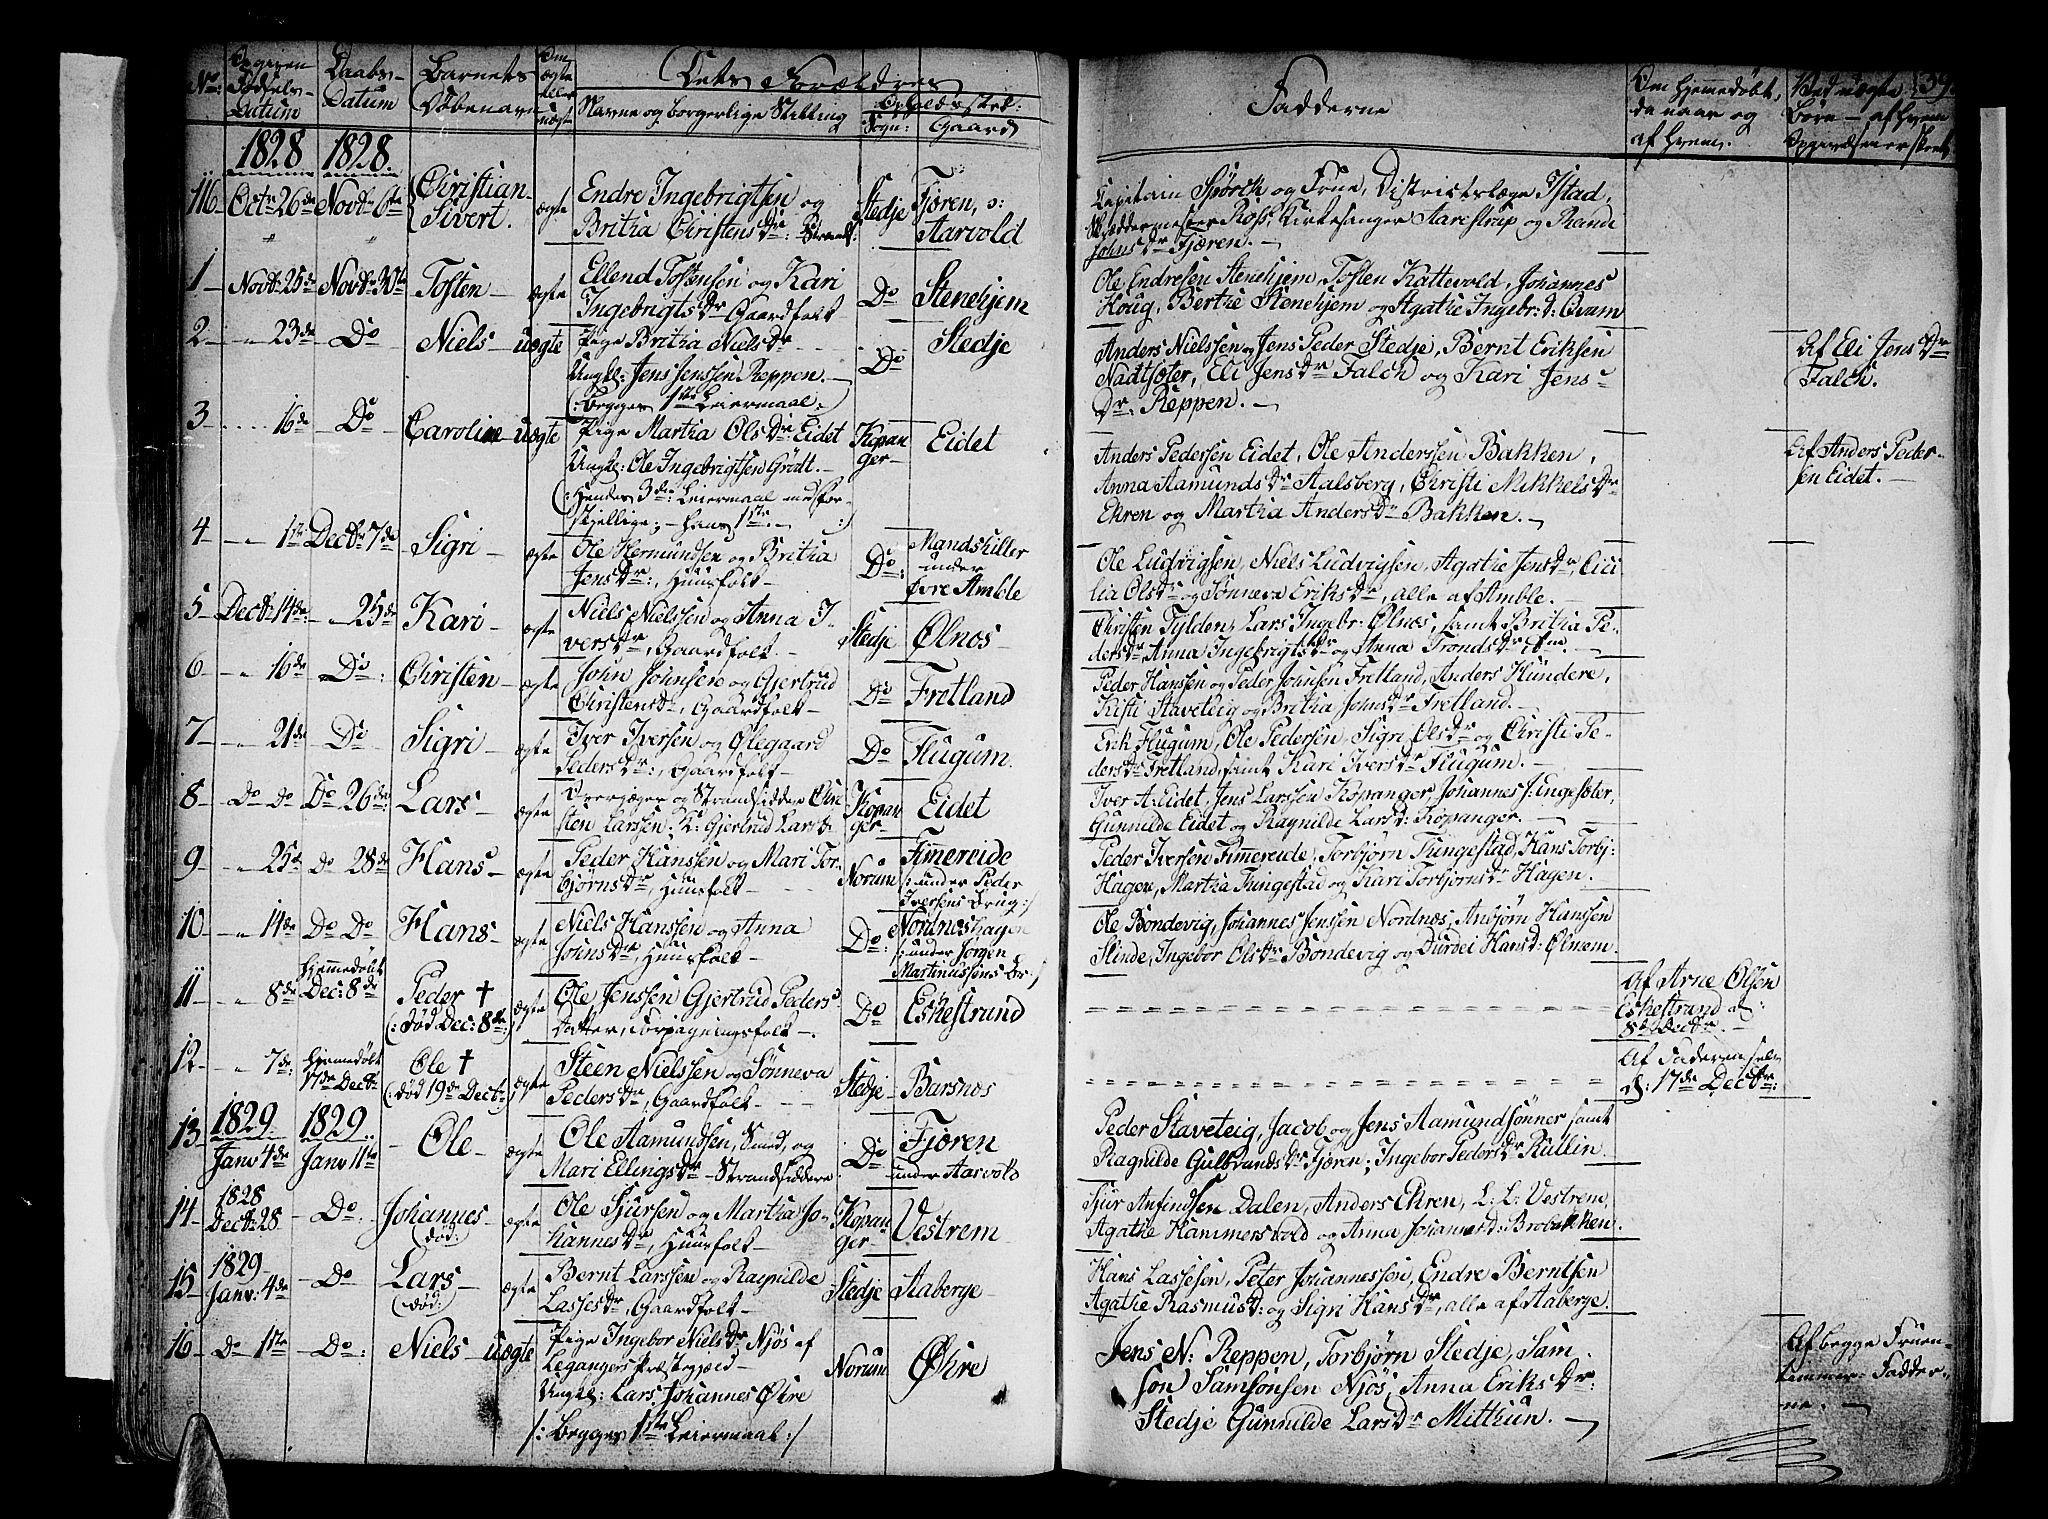 SAB, Sogndal sokneprestembete, H/Haa/Haaa/L0010: Ministerialbok nr. A 10, 1821-1838, s. 39